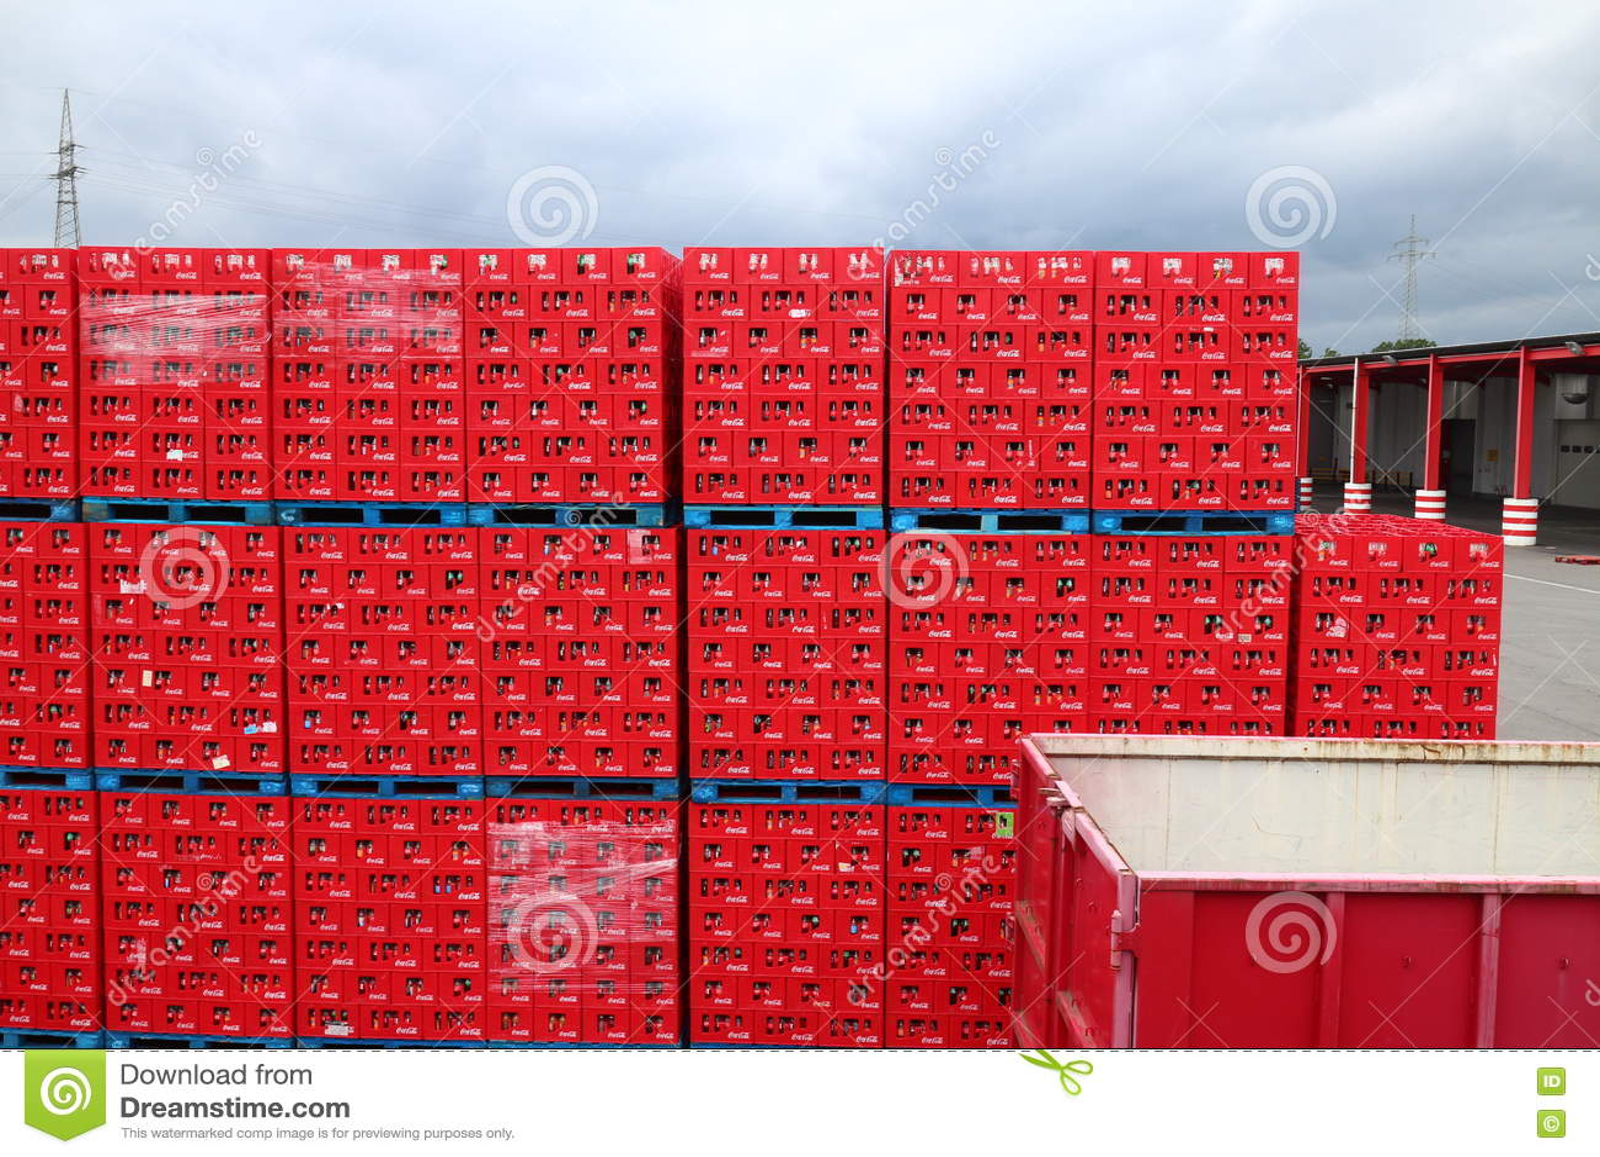 caisses de coca cola image stock ditorial image du kola 69428554. Black Bedroom Furniture Sets. Home Design Ideas